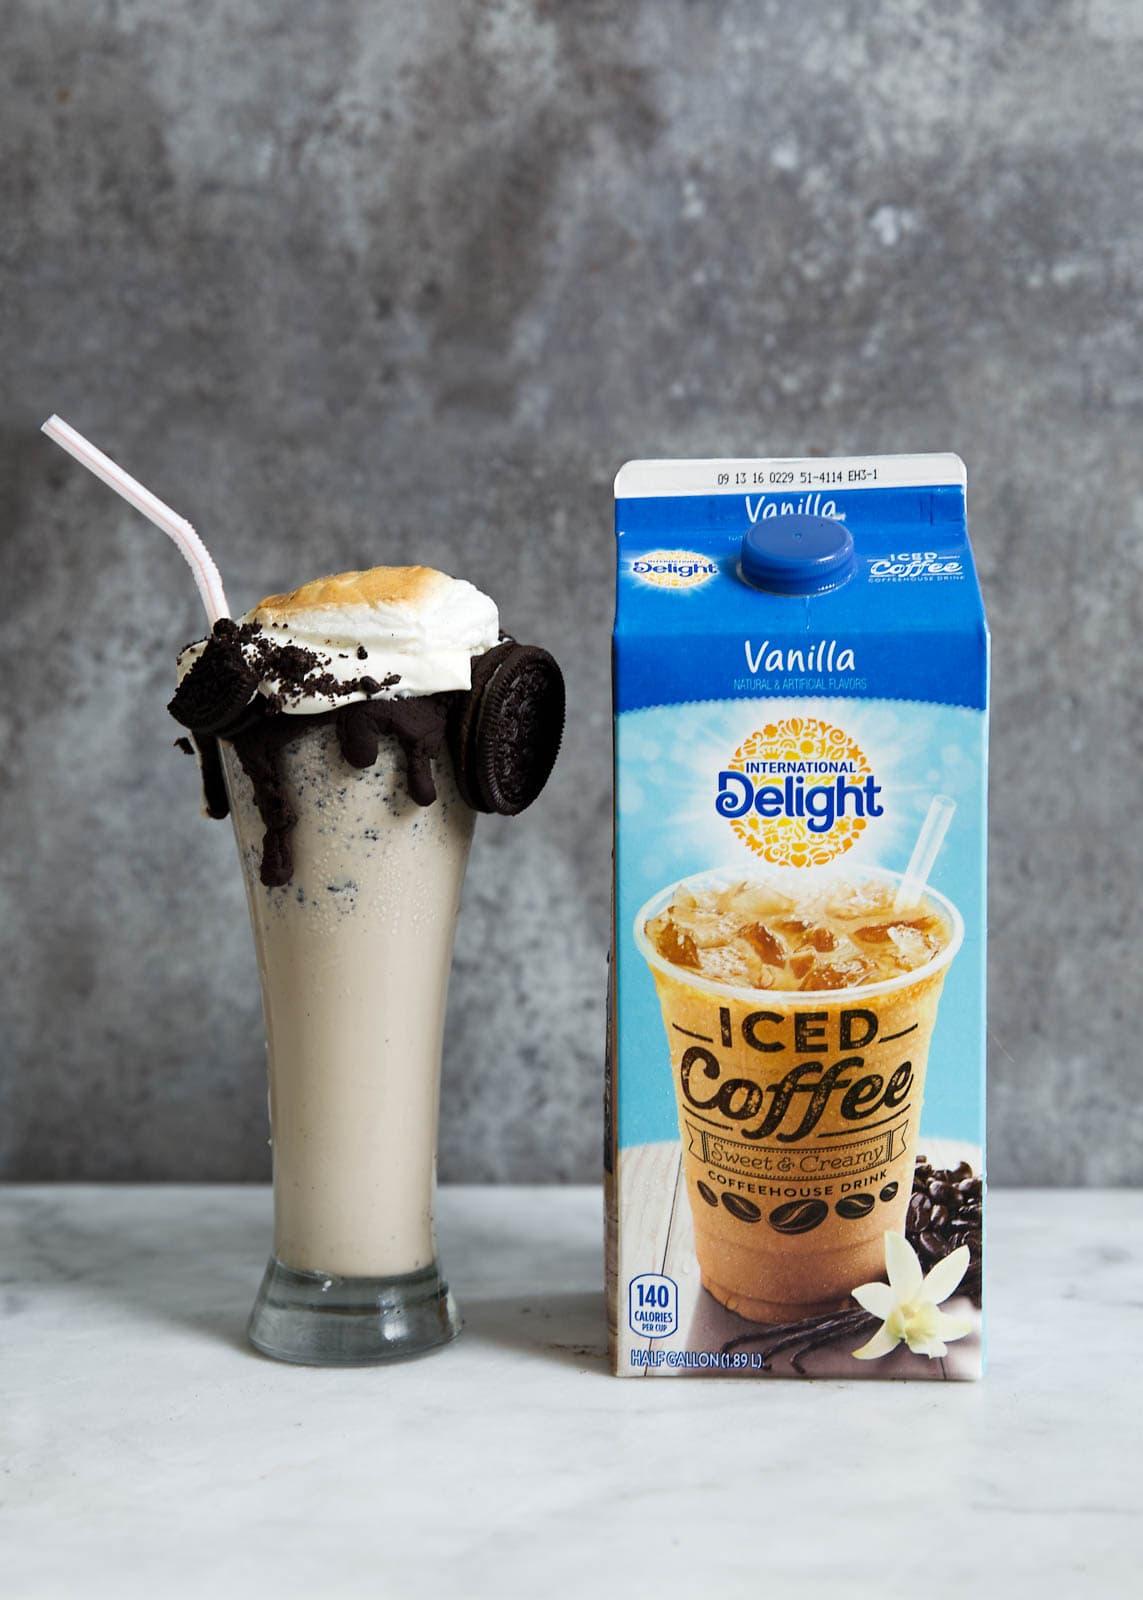 Iced Coffee Cookies and Cream Milkshake with carton of coffee